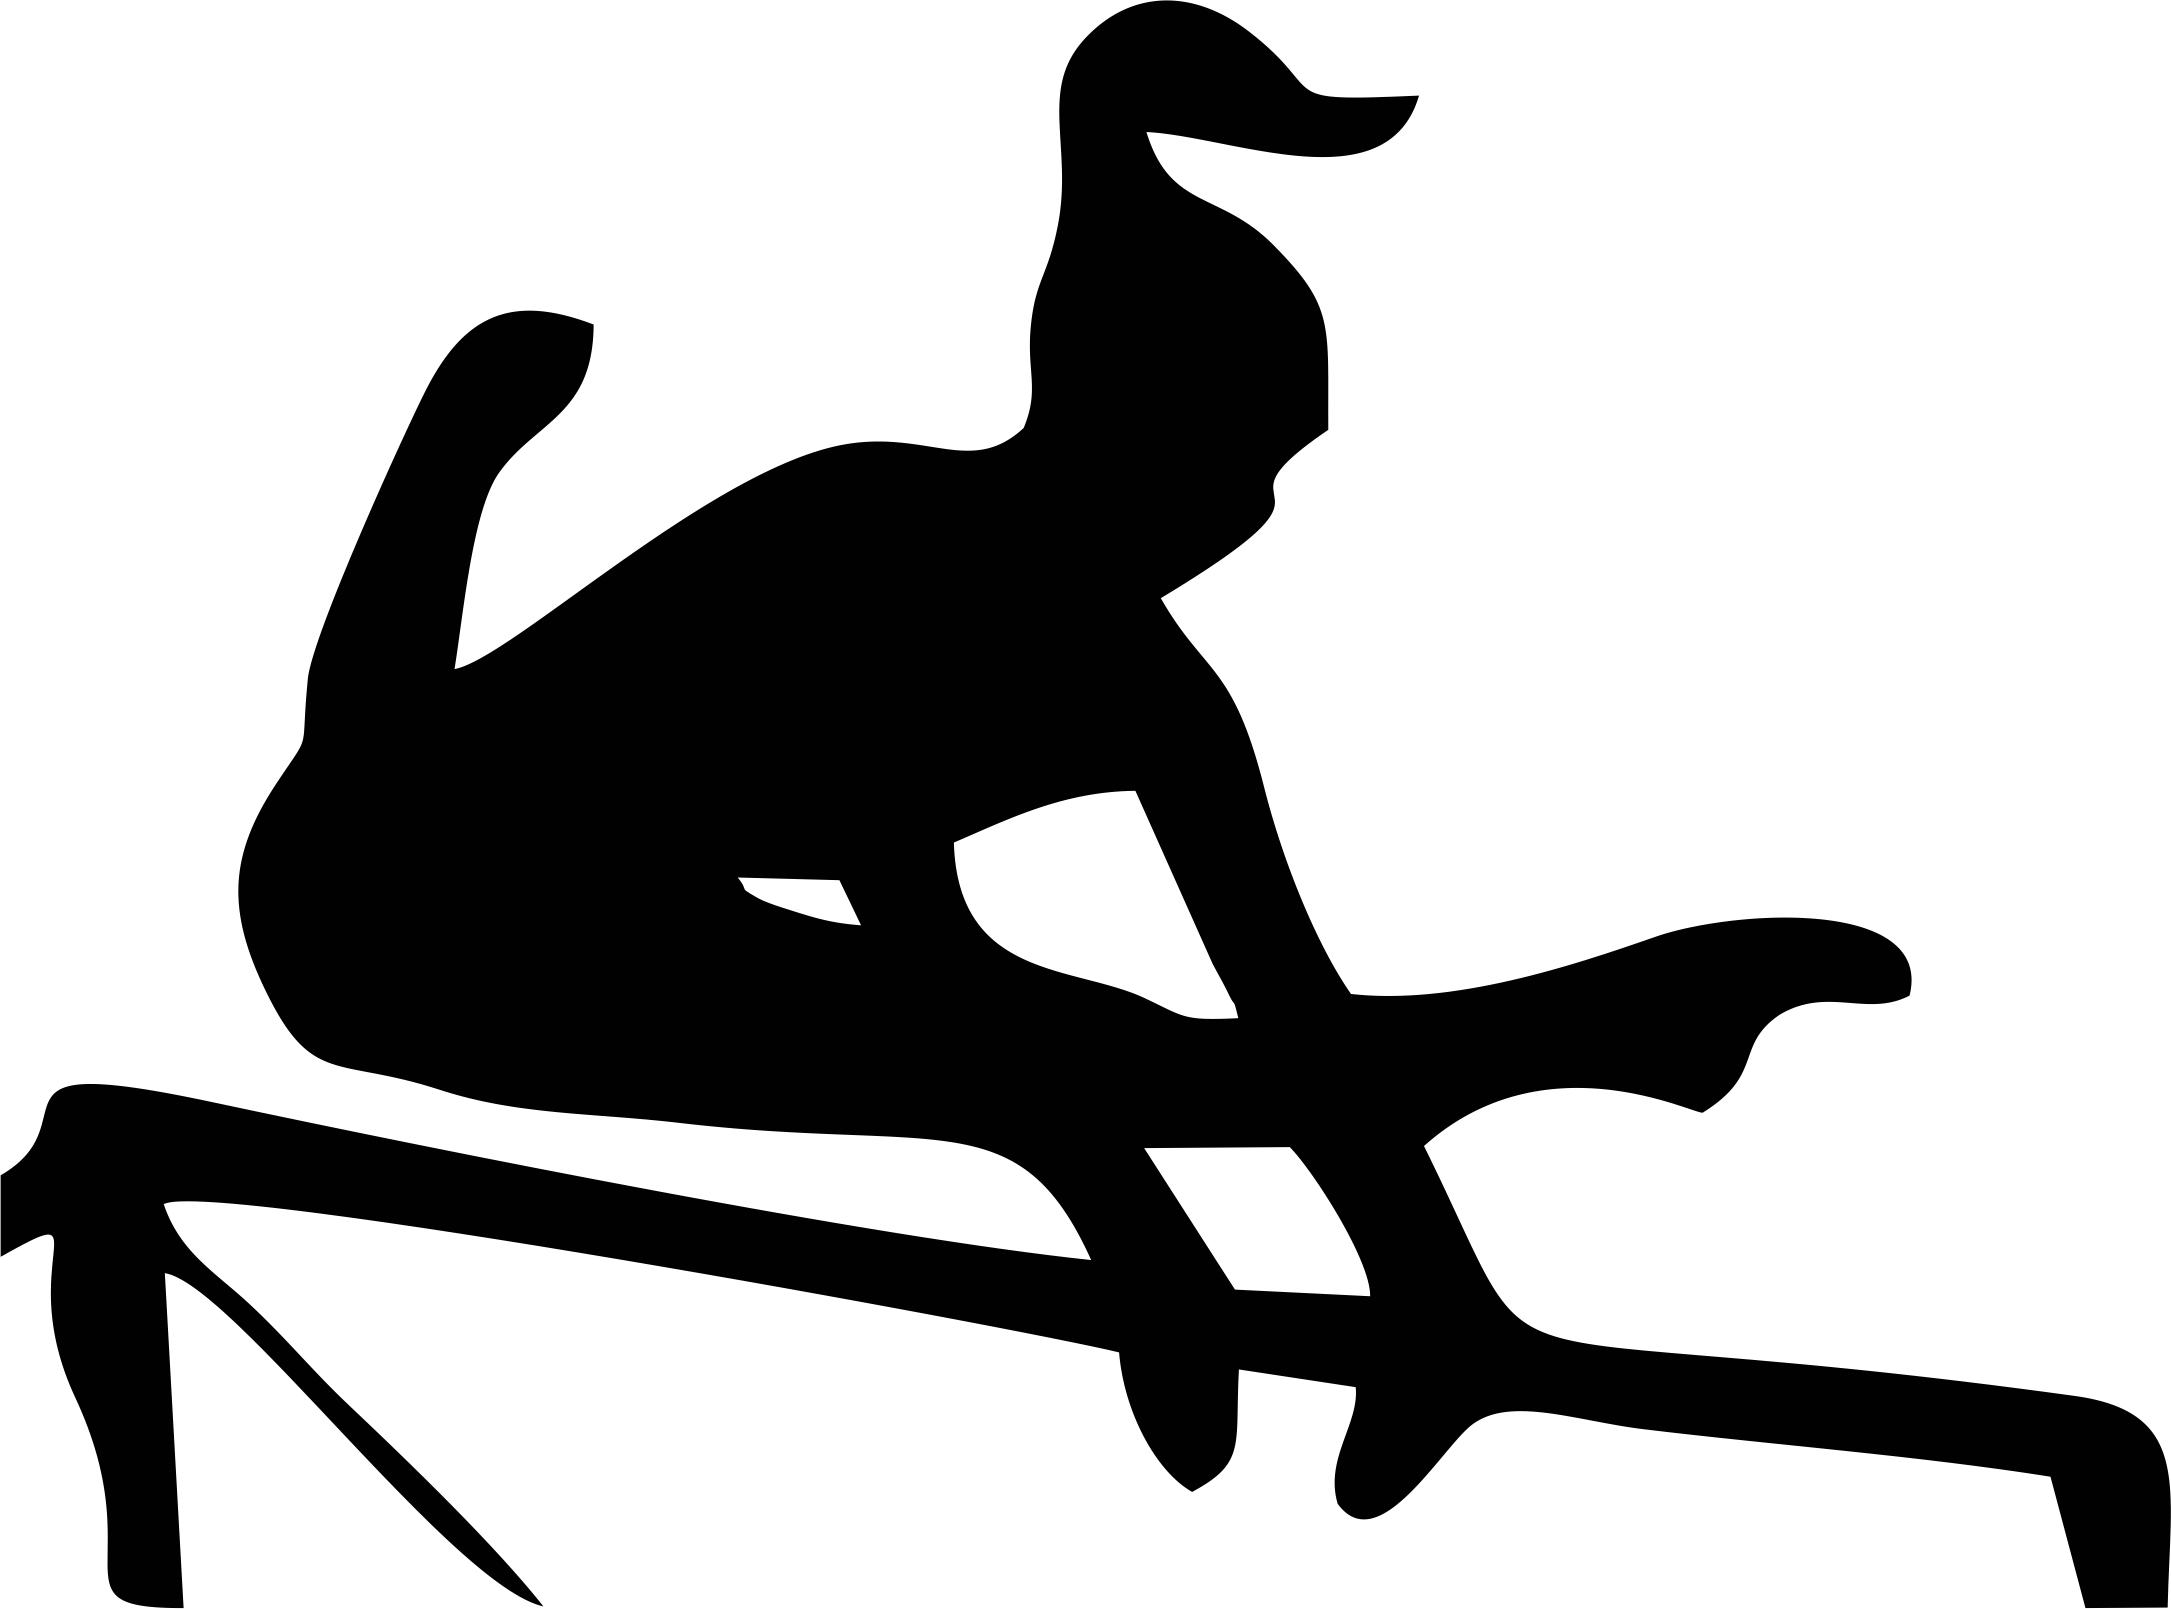 2171x1609 Pin By Rosana M. On Dibujos Gym Silhouette, Cricut